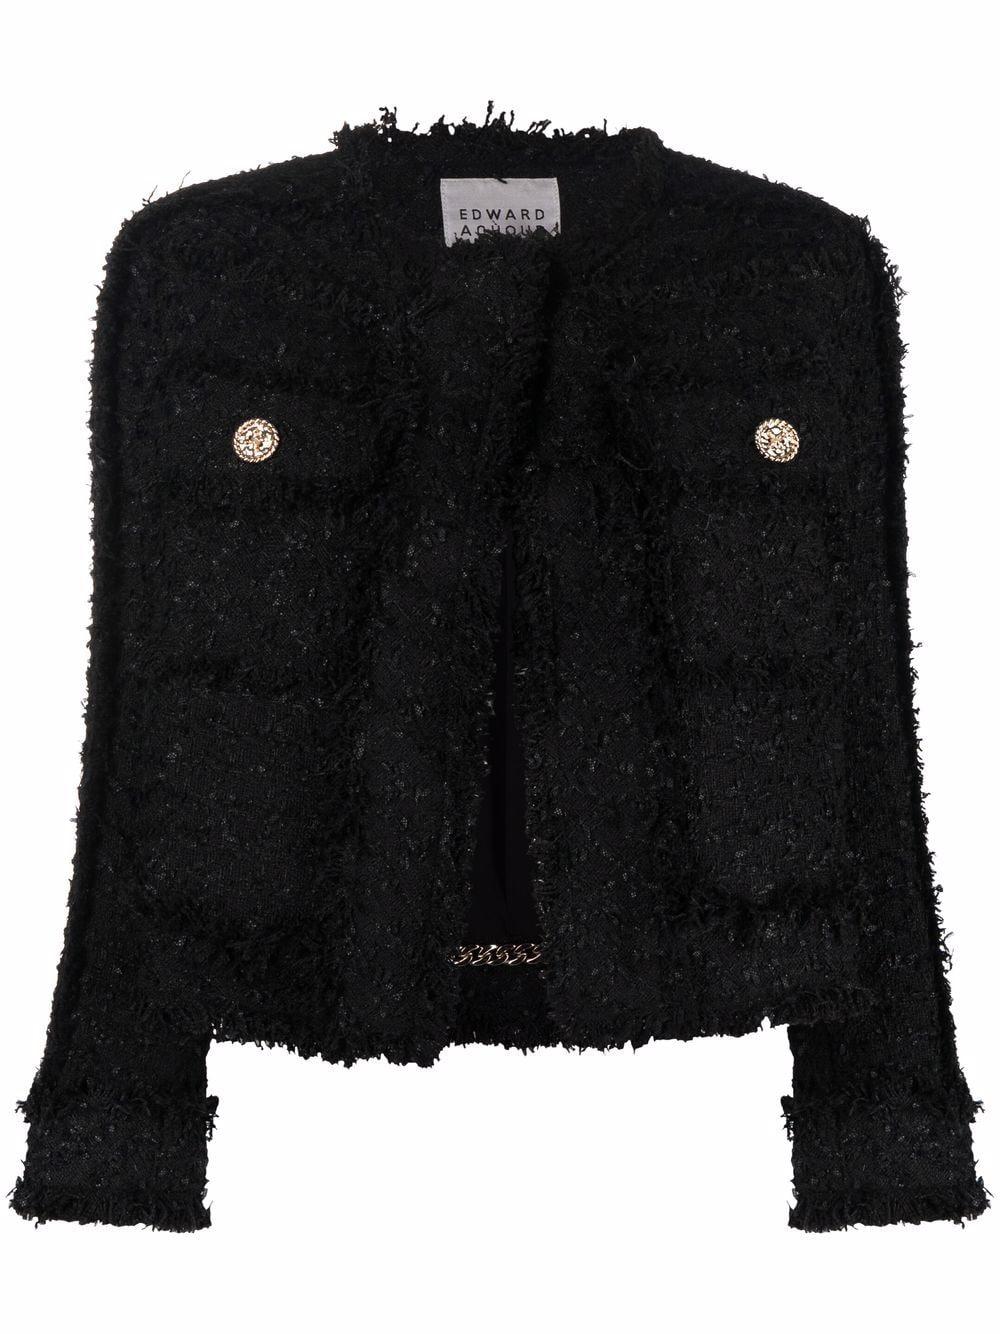 Black wool fringe trimmed tweed jacket  EDWARD ACHOUR PARIS      010109-32NERO